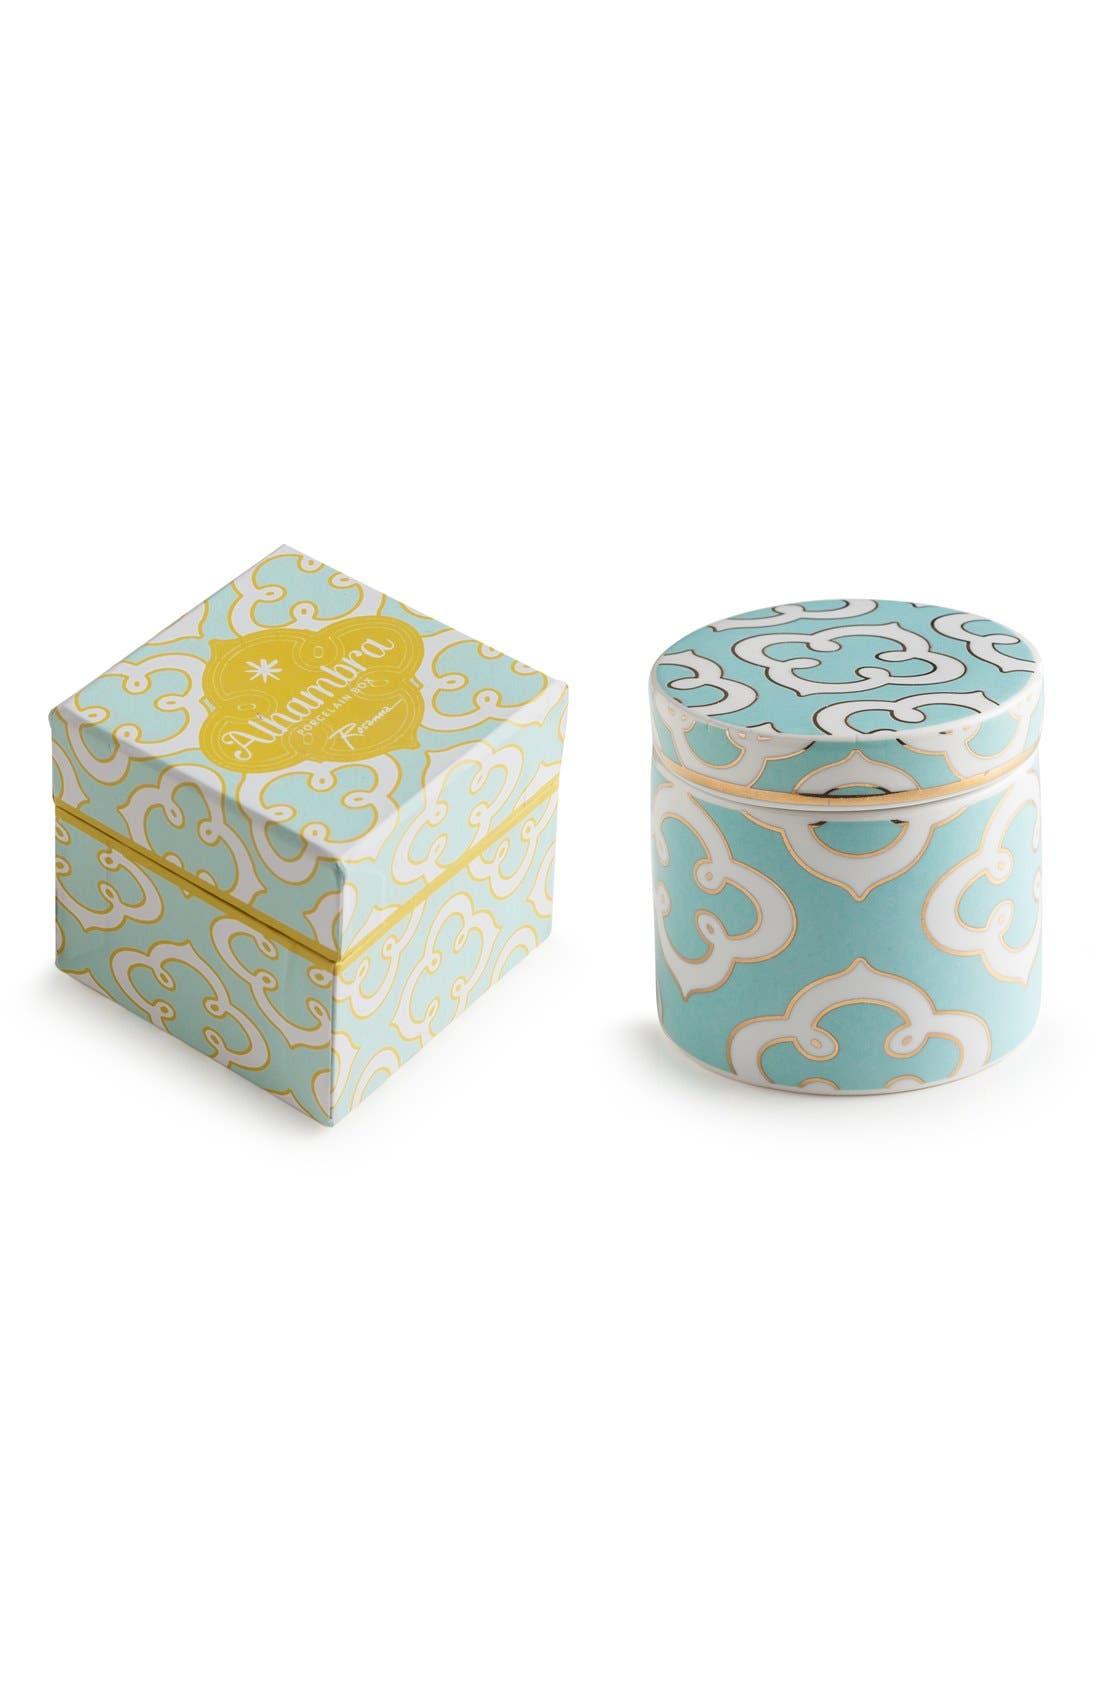 'Alhambra' Porcelain Box,                             Main thumbnail 1, color,                             Blue